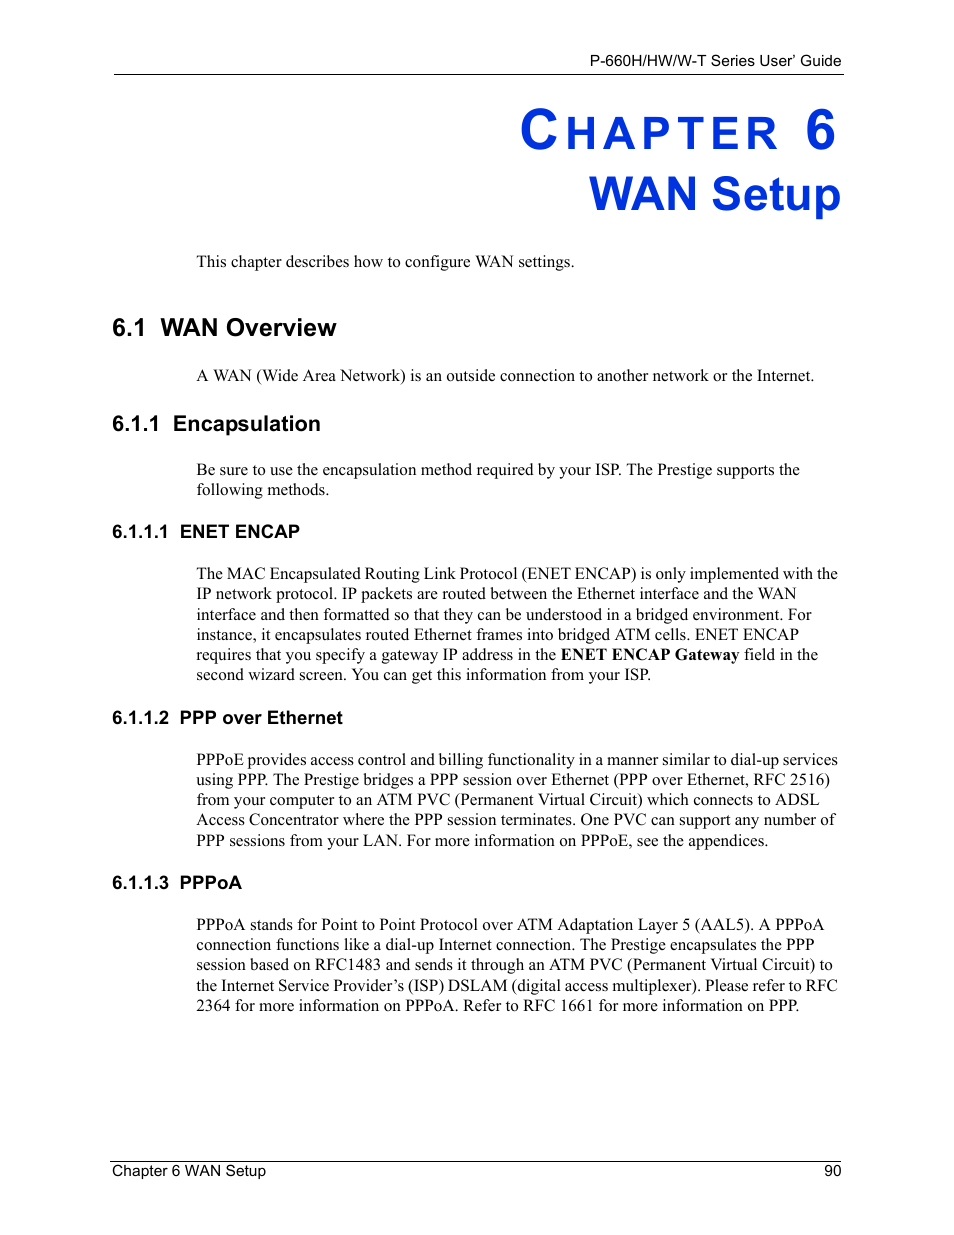 Wan setup, 1 encapsulation, 1 enet encap | ZyXEL Communications ADSL